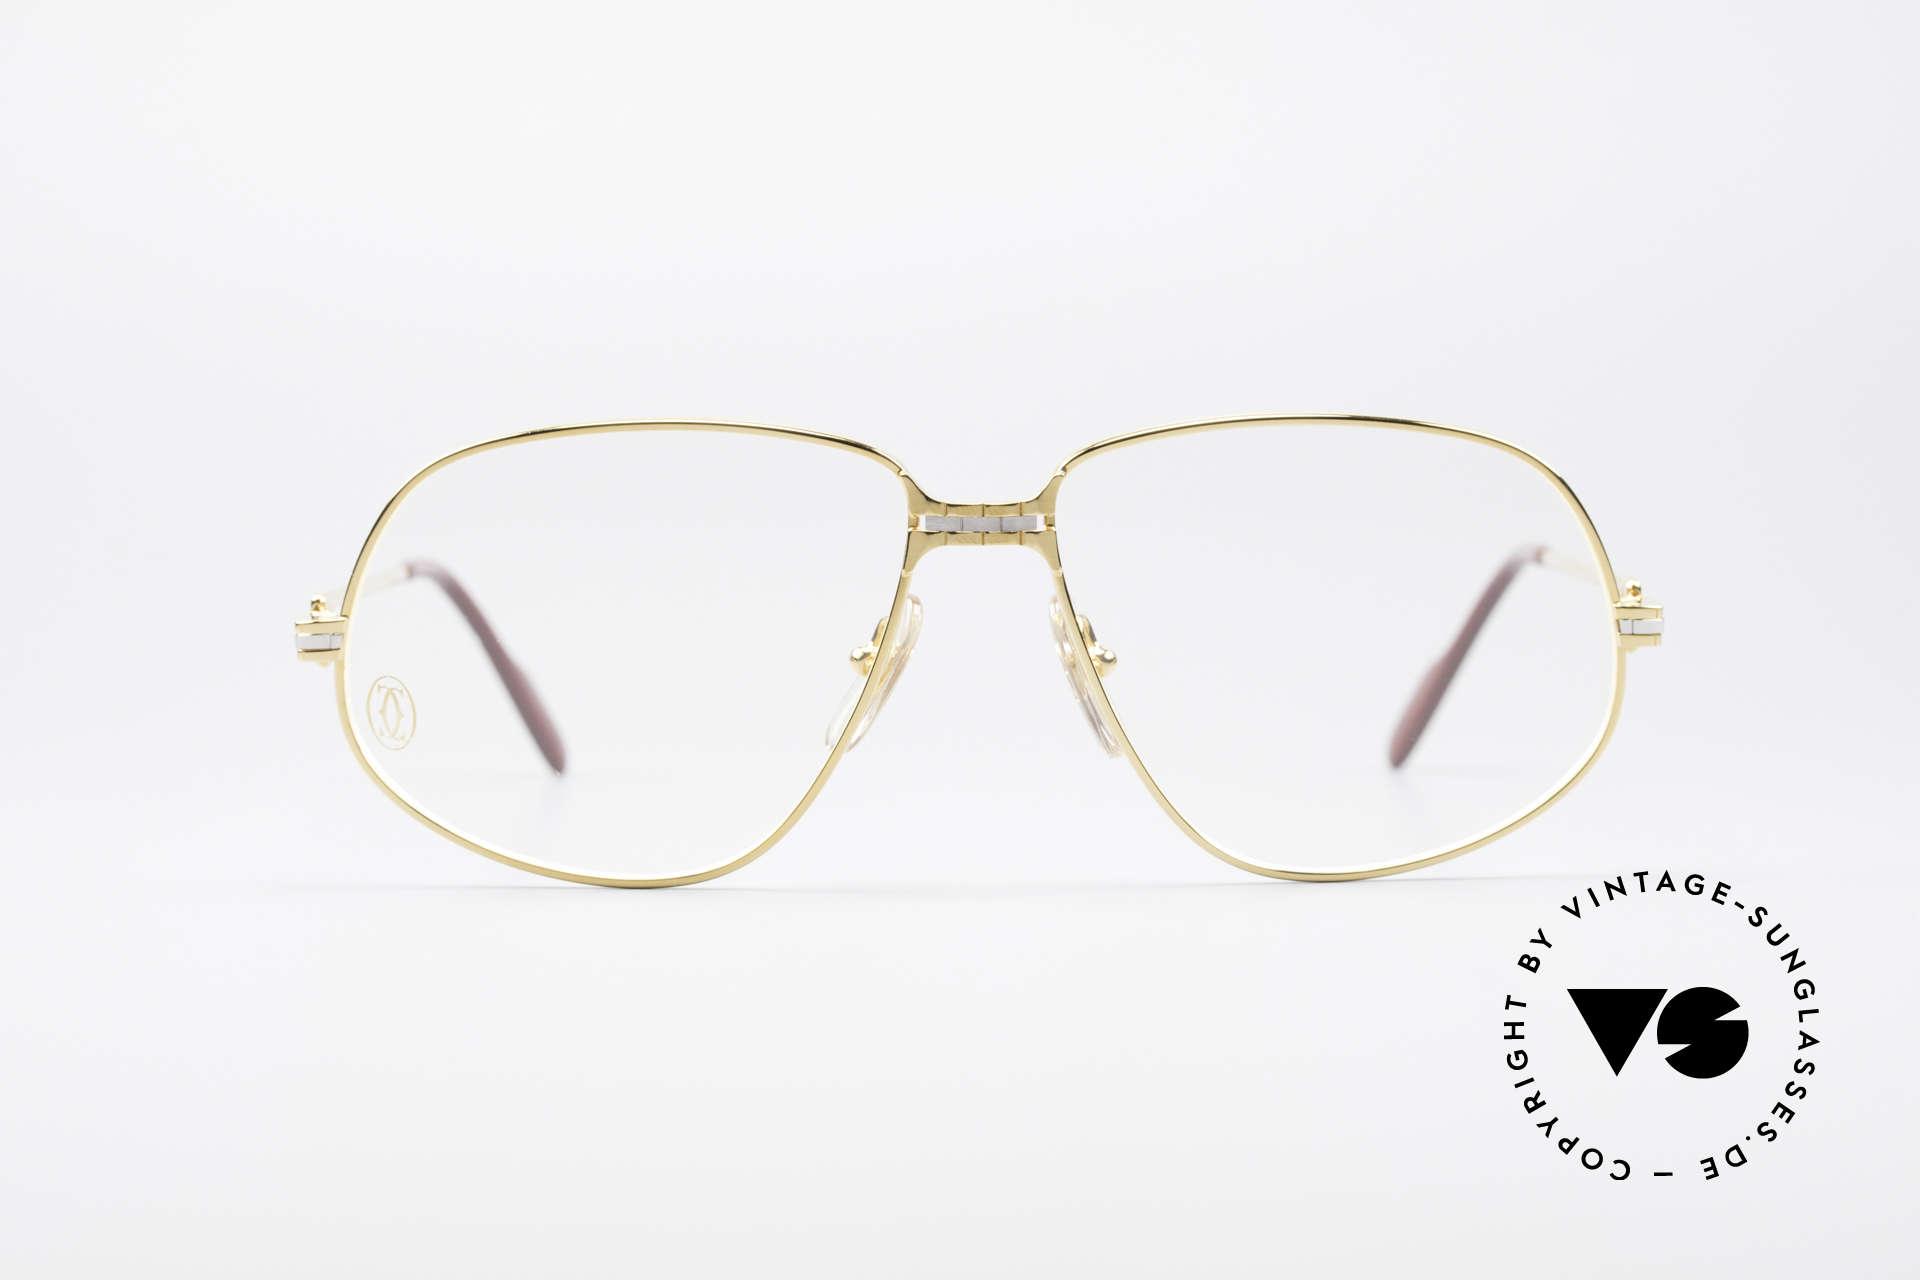 Cartier Panthere G.M. - L 1980's Luxury Eyeglass-Frame, G.M. stands for 'grande modèle' for monsieur / gentleman, Made for Men